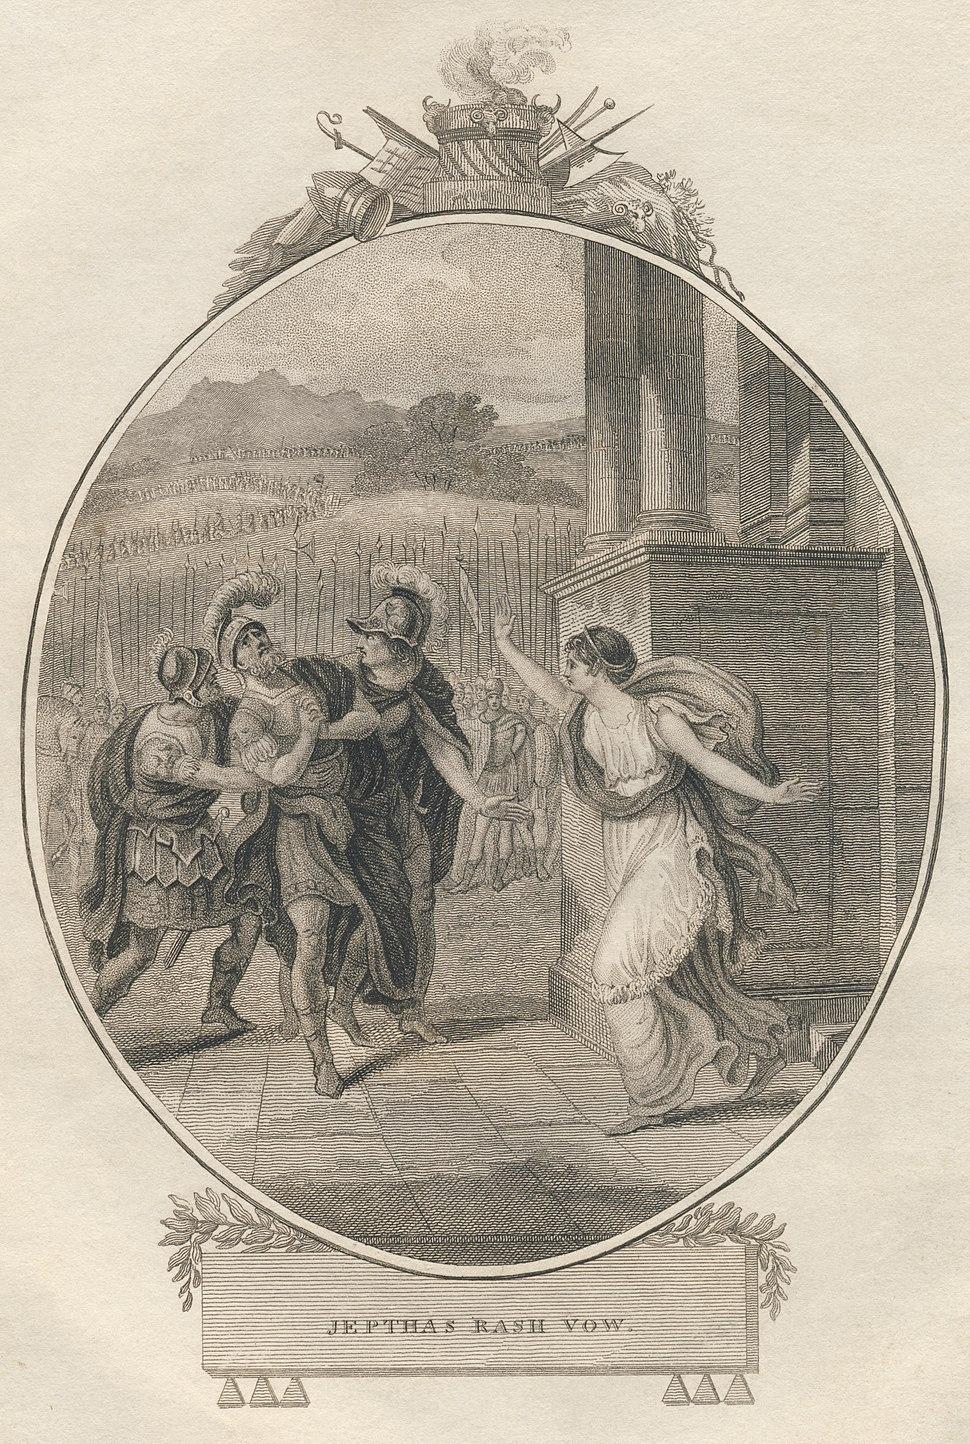 James Gundee & M. Jones - Jeptha's Rash Vow